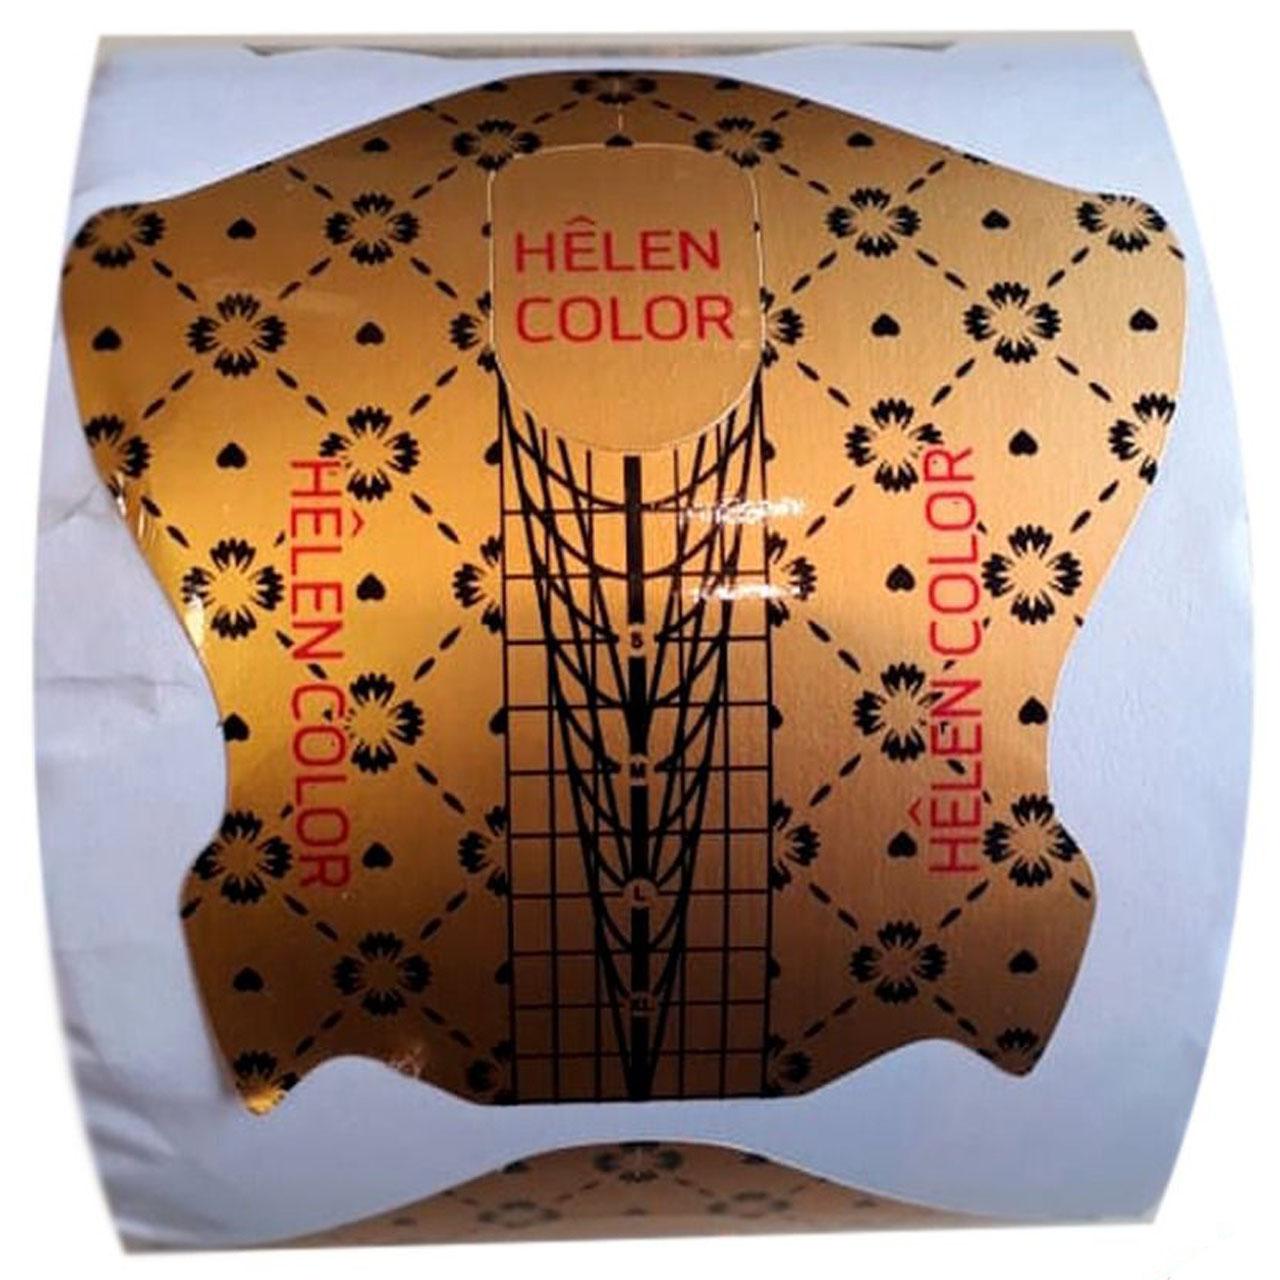 Molde dourado com 500 unidades - Helen Color